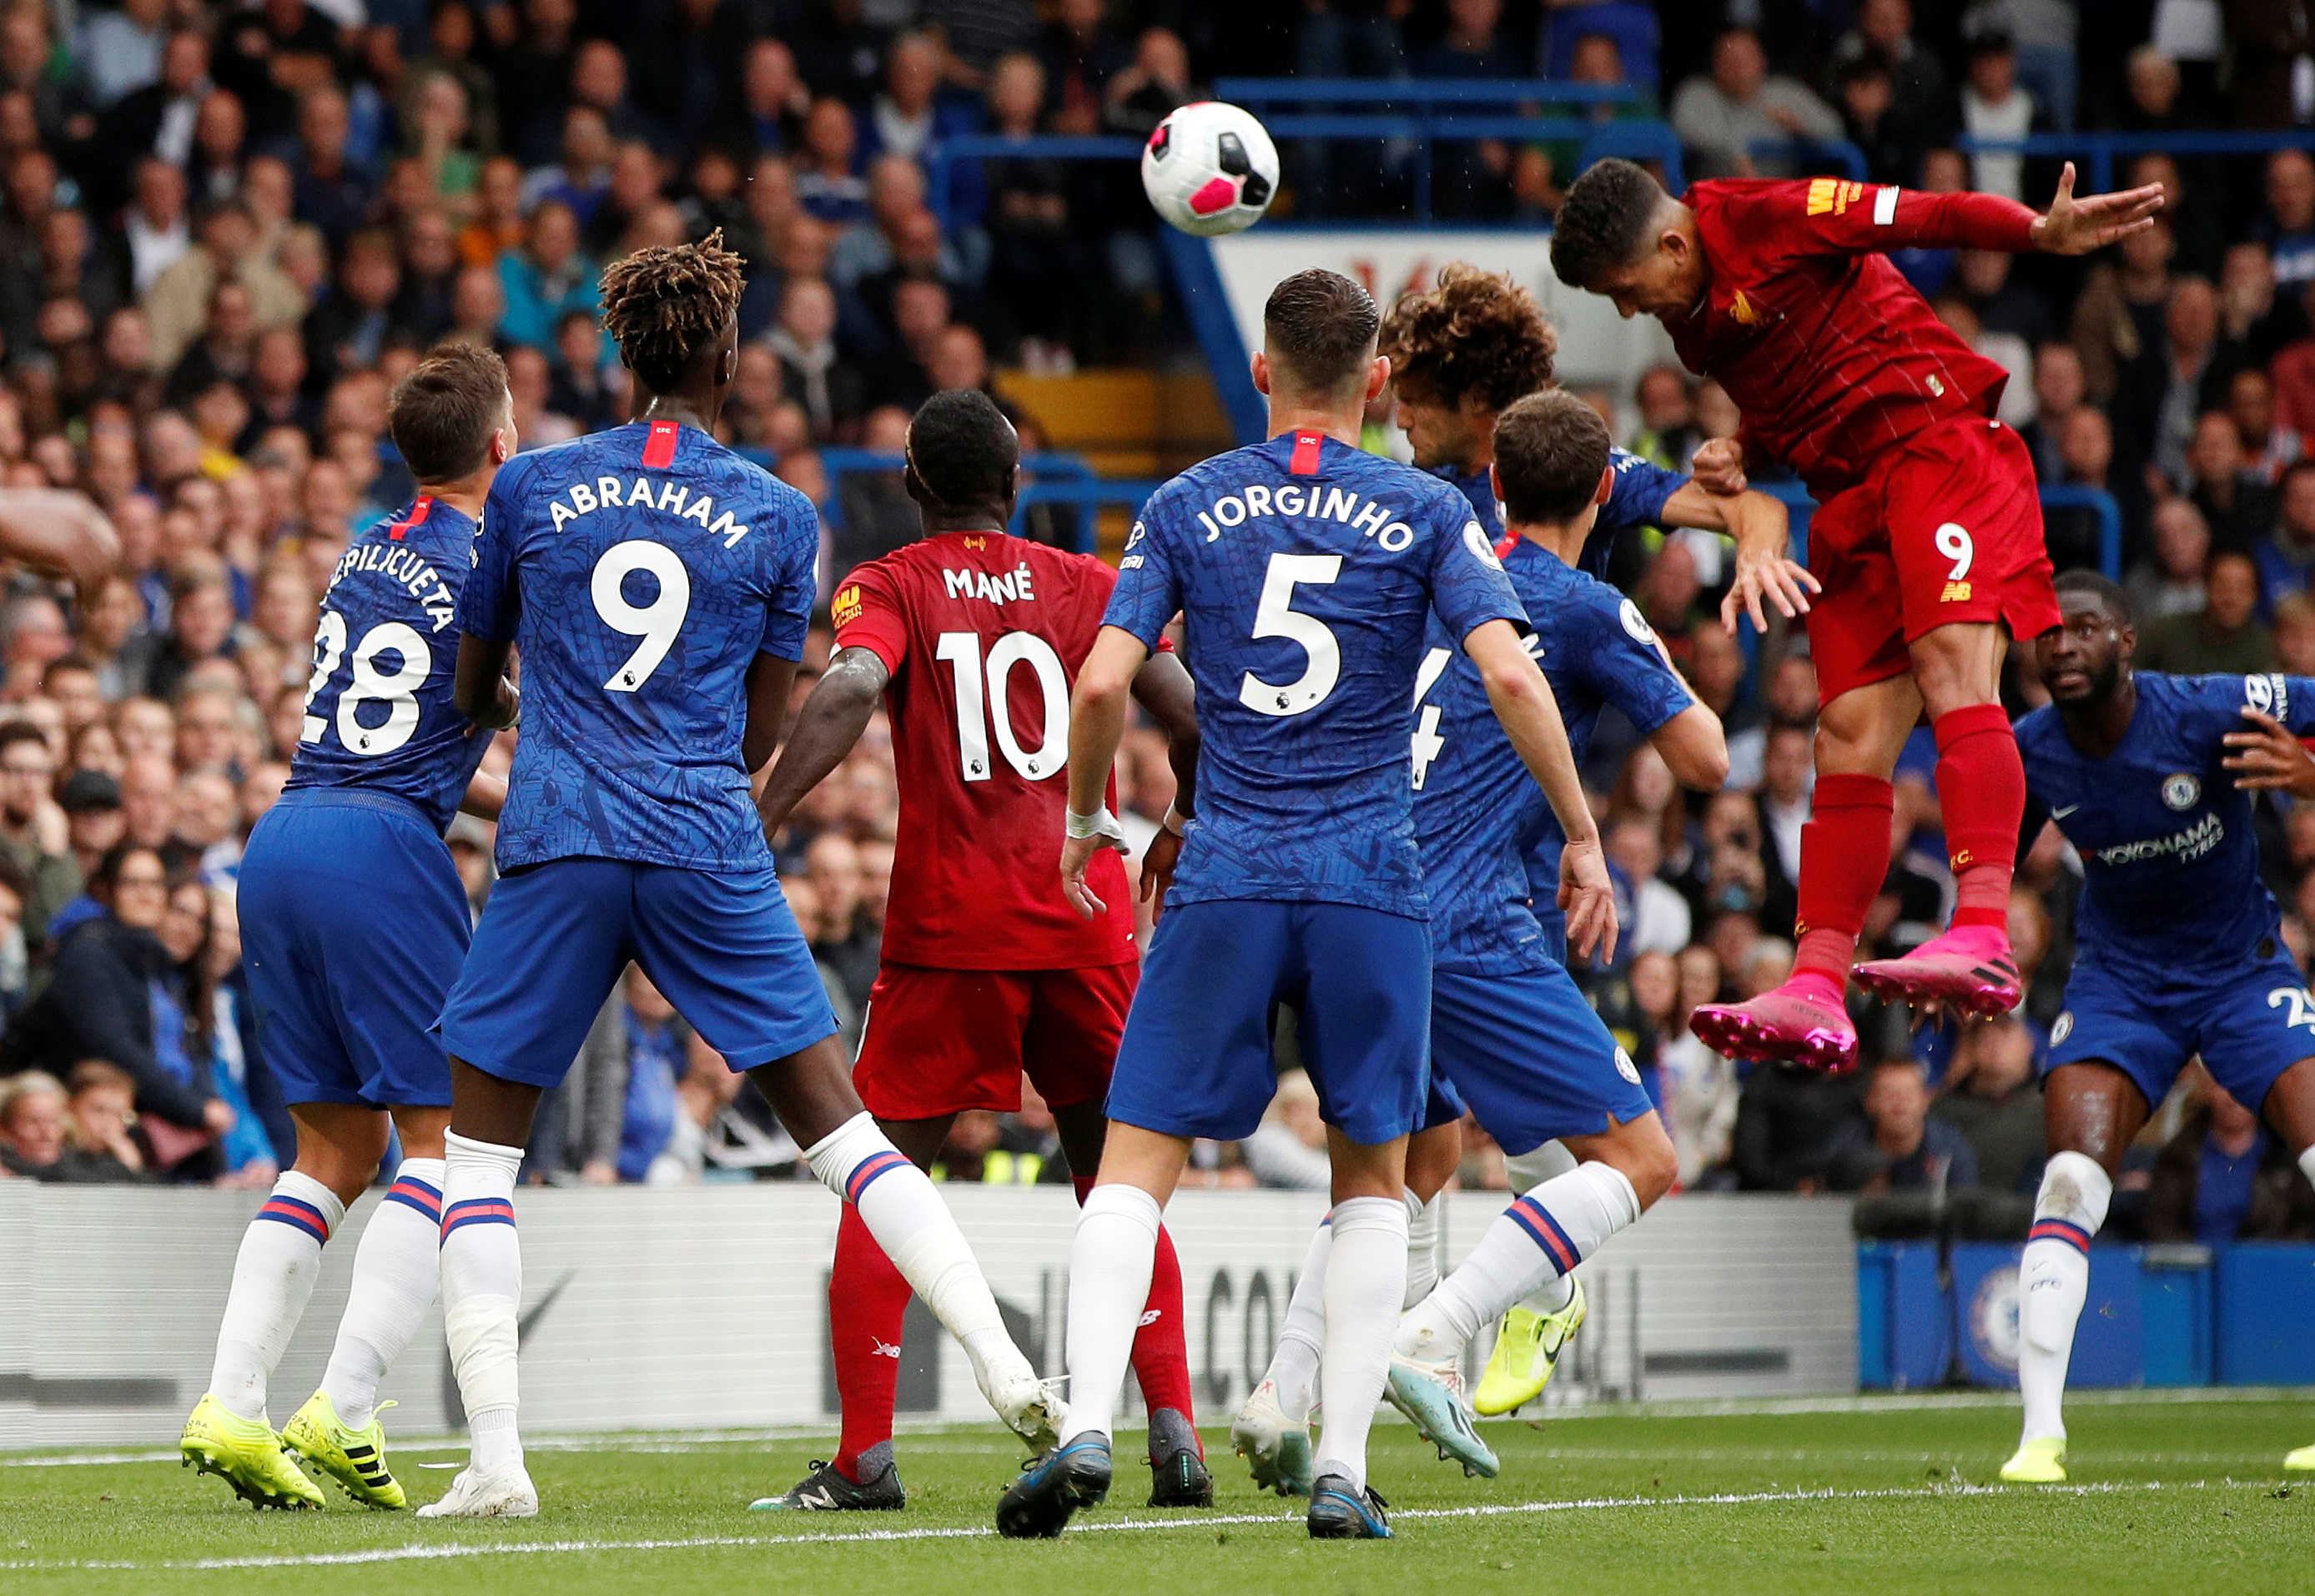 Liverpool set three unbelievable records at Stamford Bridge